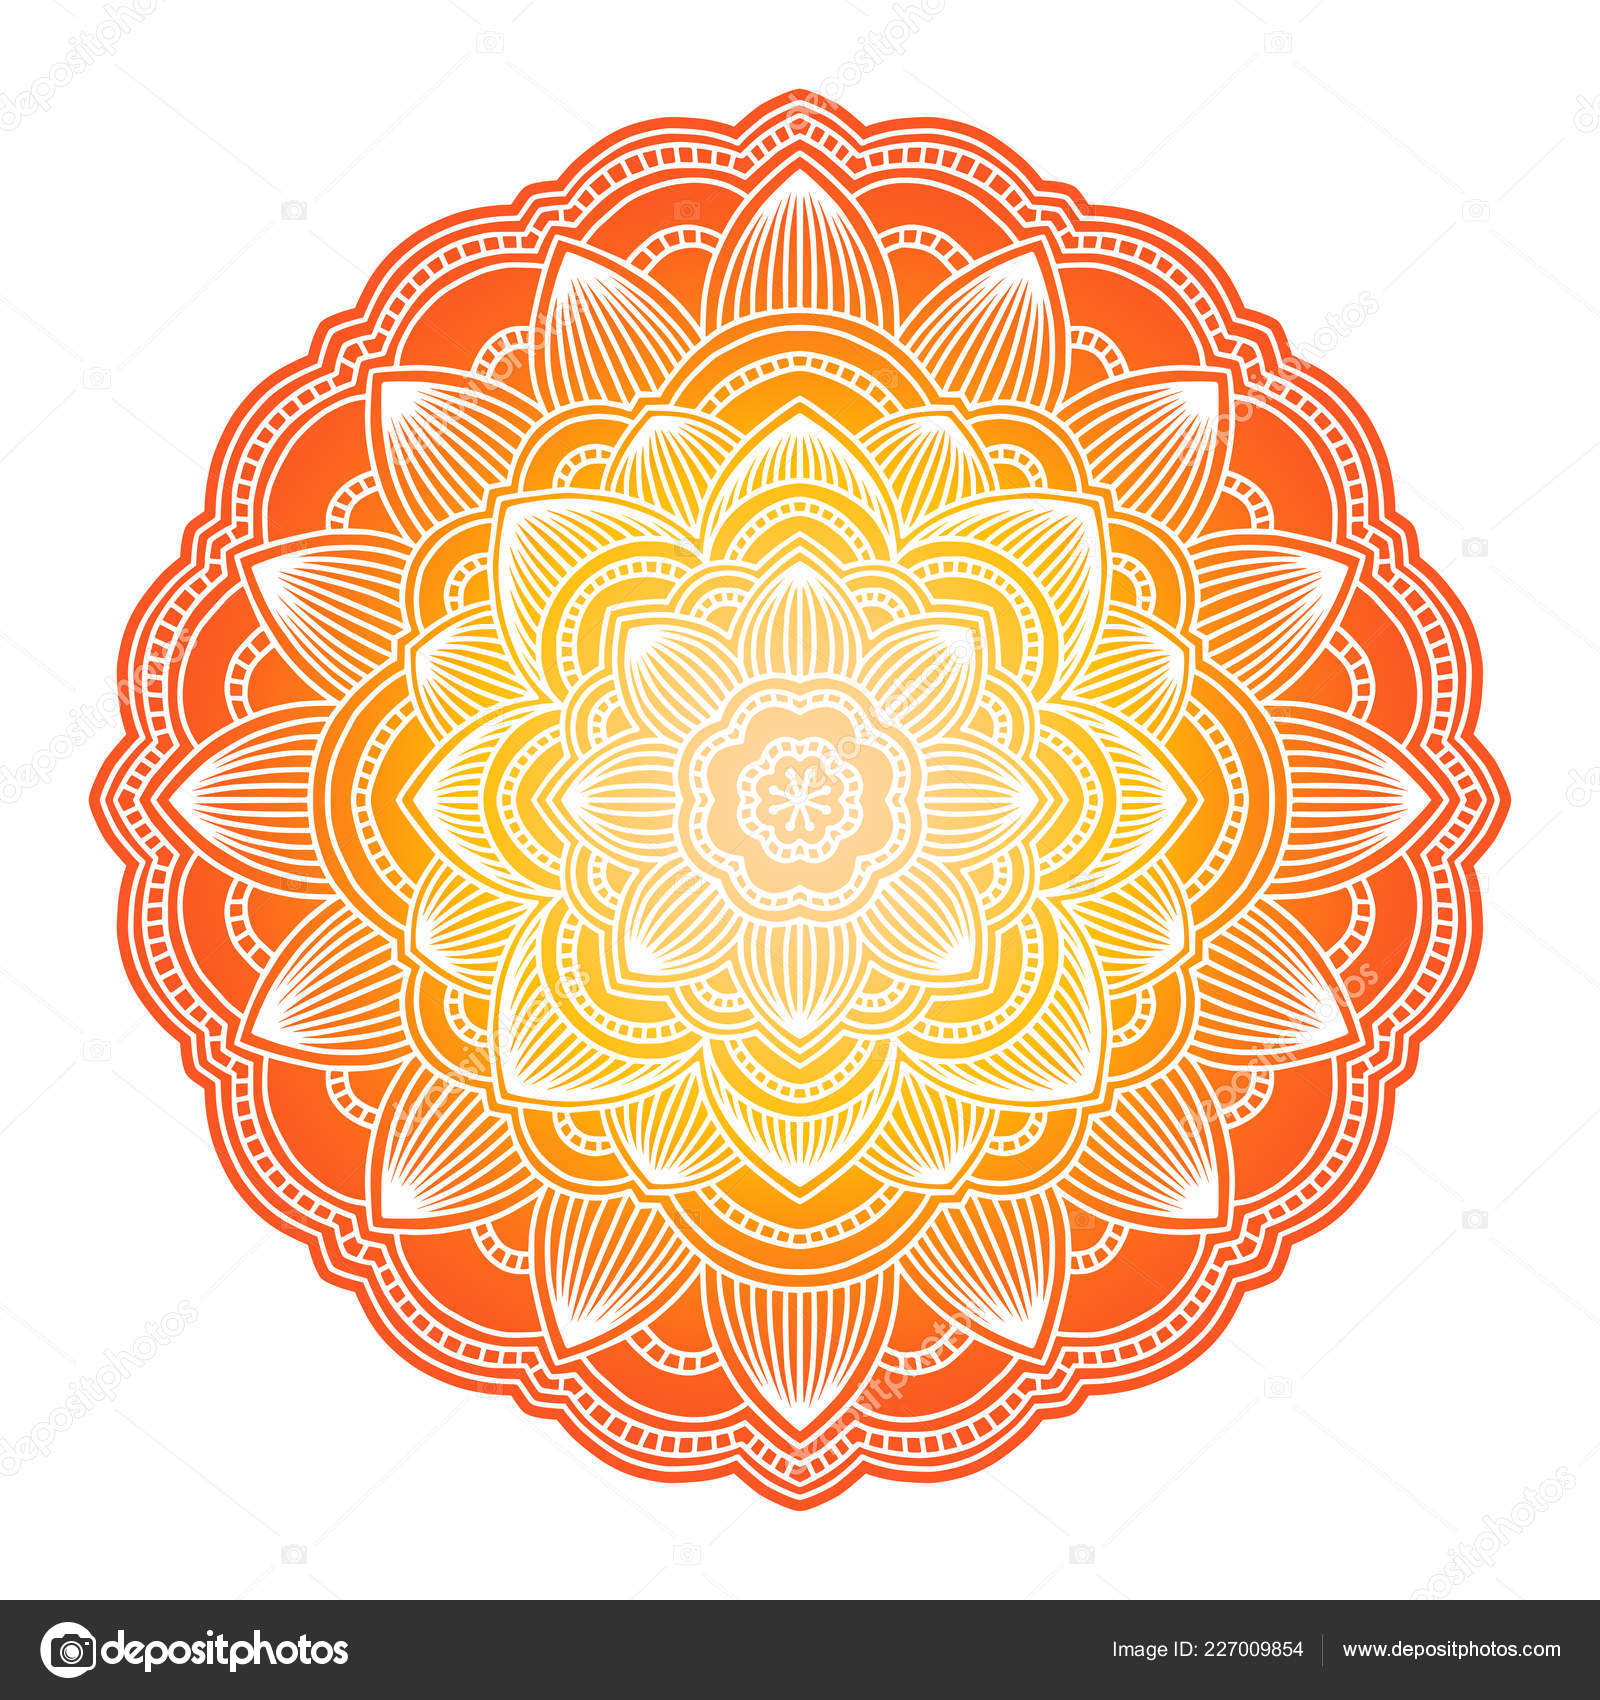 depositphotos stock illustration gra nt mandala circle ethnic ornament